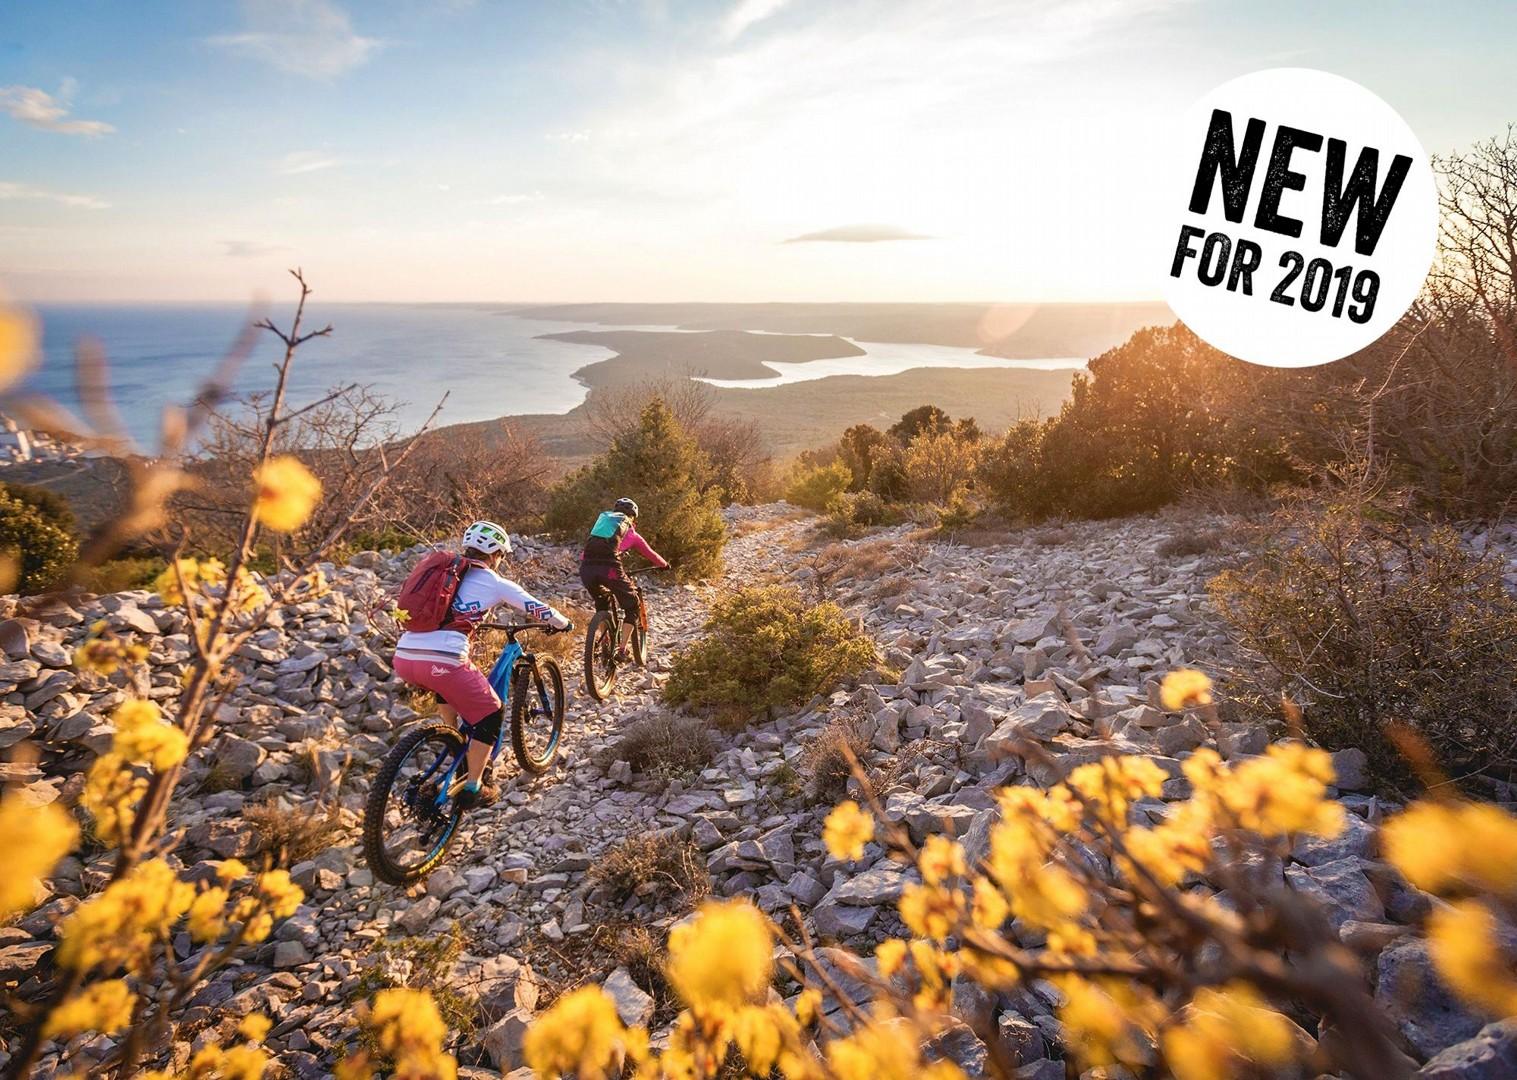 croatia-terra-magica-guided-mountain-biking-holiday.jpg - NEW! Croatia - Terra Magica - Mountain Biking